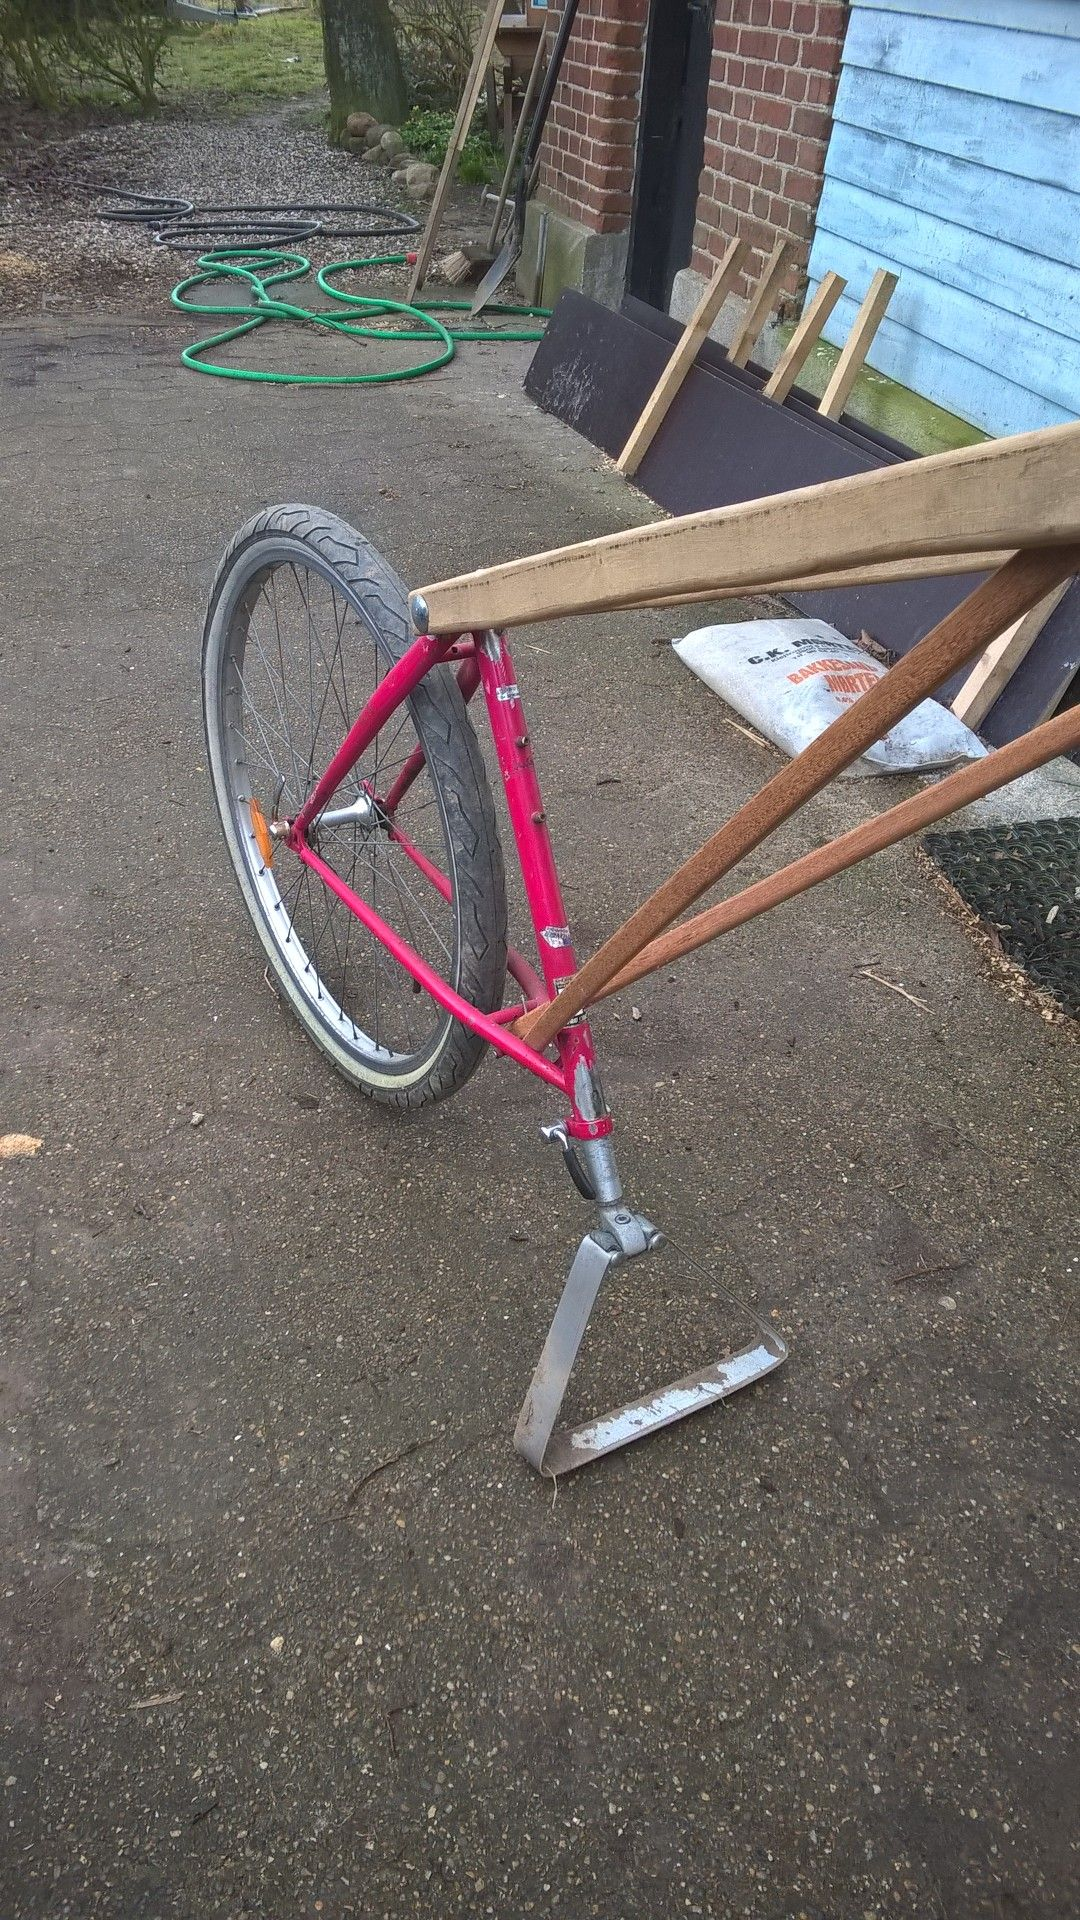 Bike chopper hoe weeder from old bike Diy tool | Farm Hack